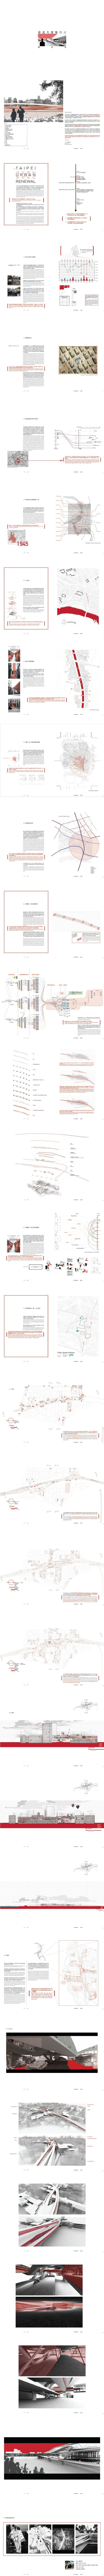 BIG Architecture renewal proposal, 2014 / By Max Zhong